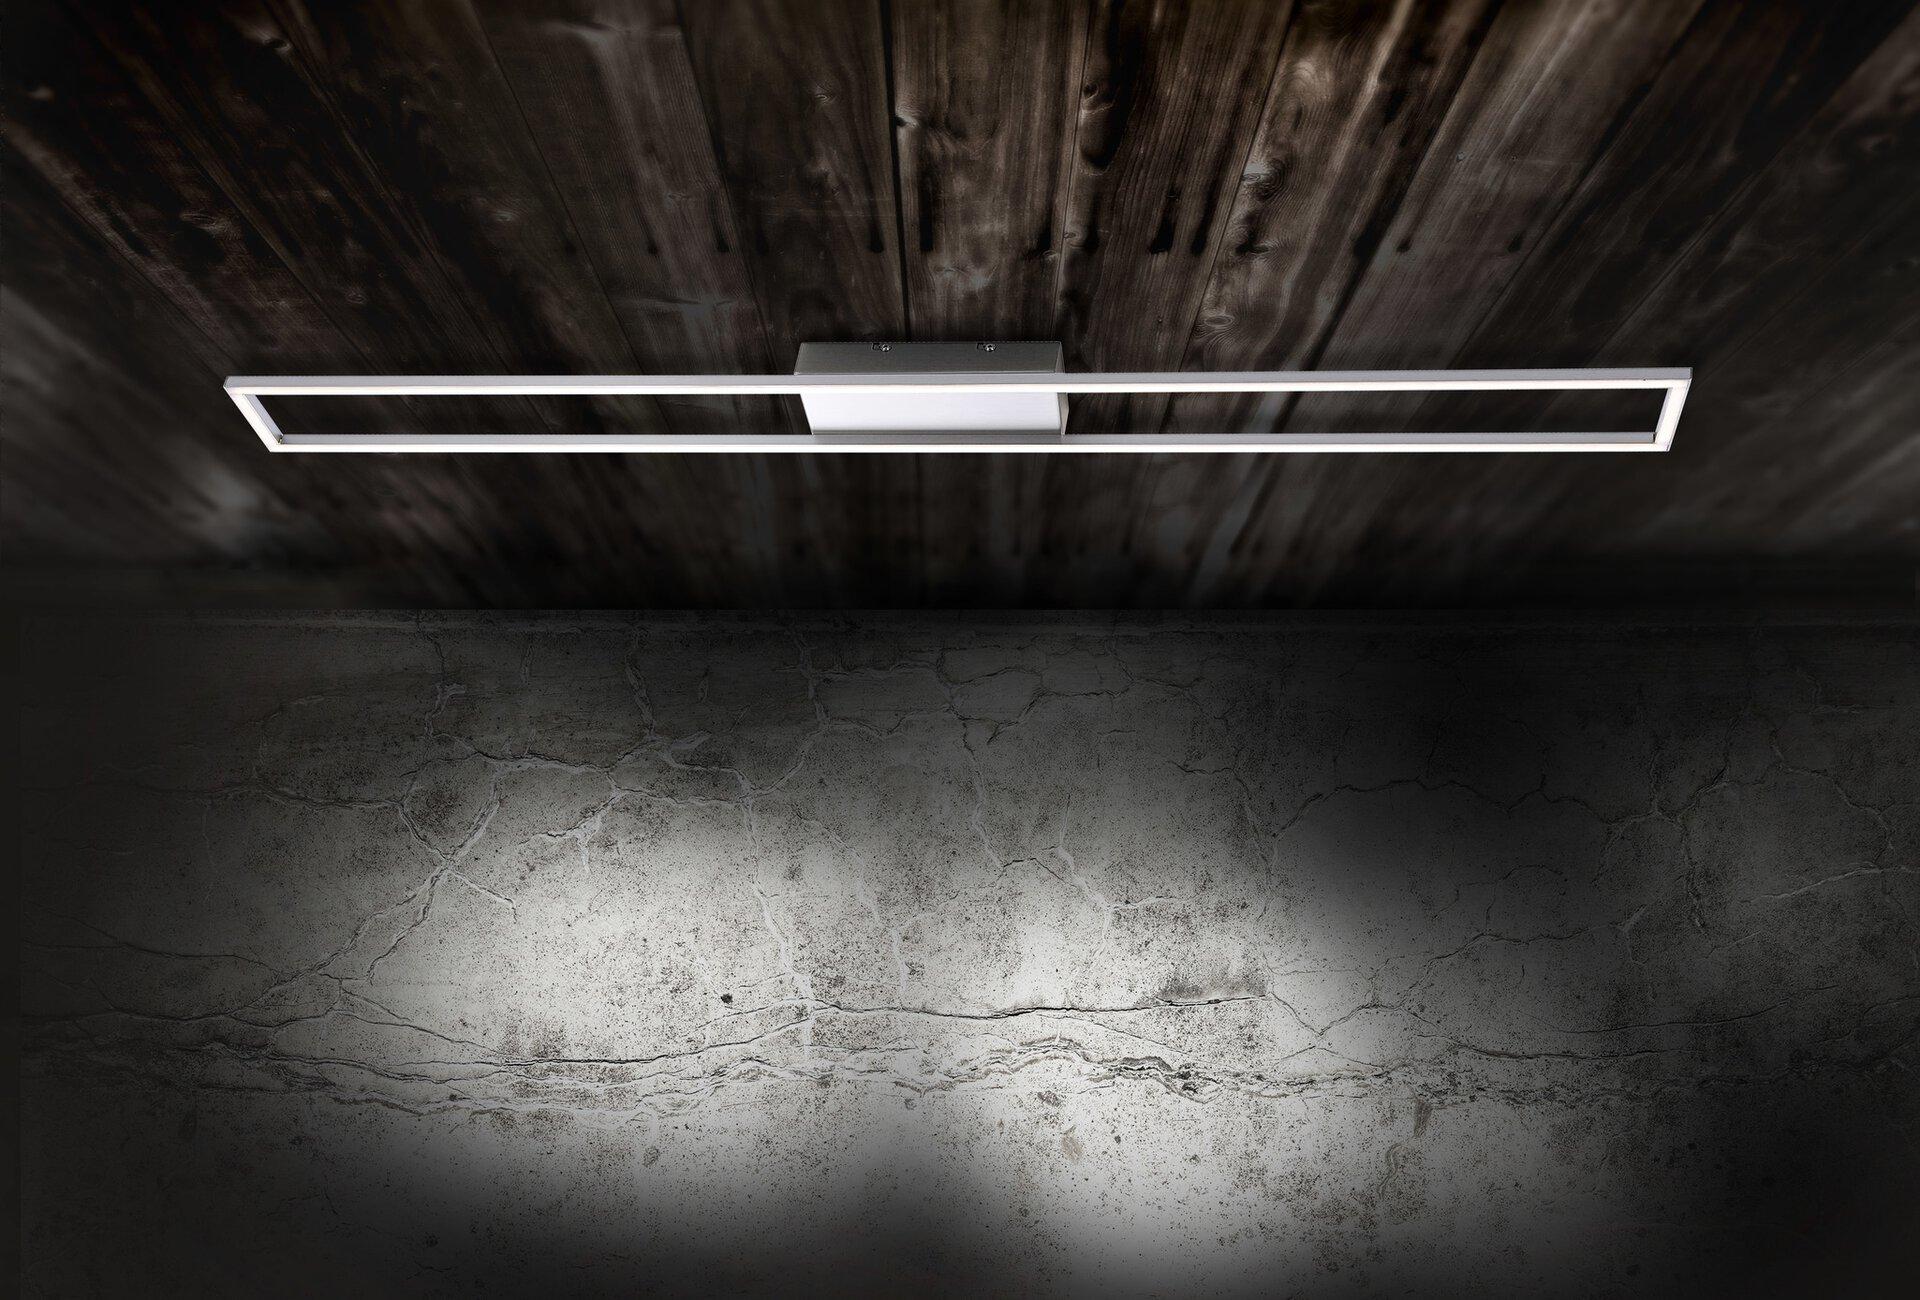 Deckenleuchte INIGO Paul Neuhaus Metall silber 10 x 6 x 110 cm